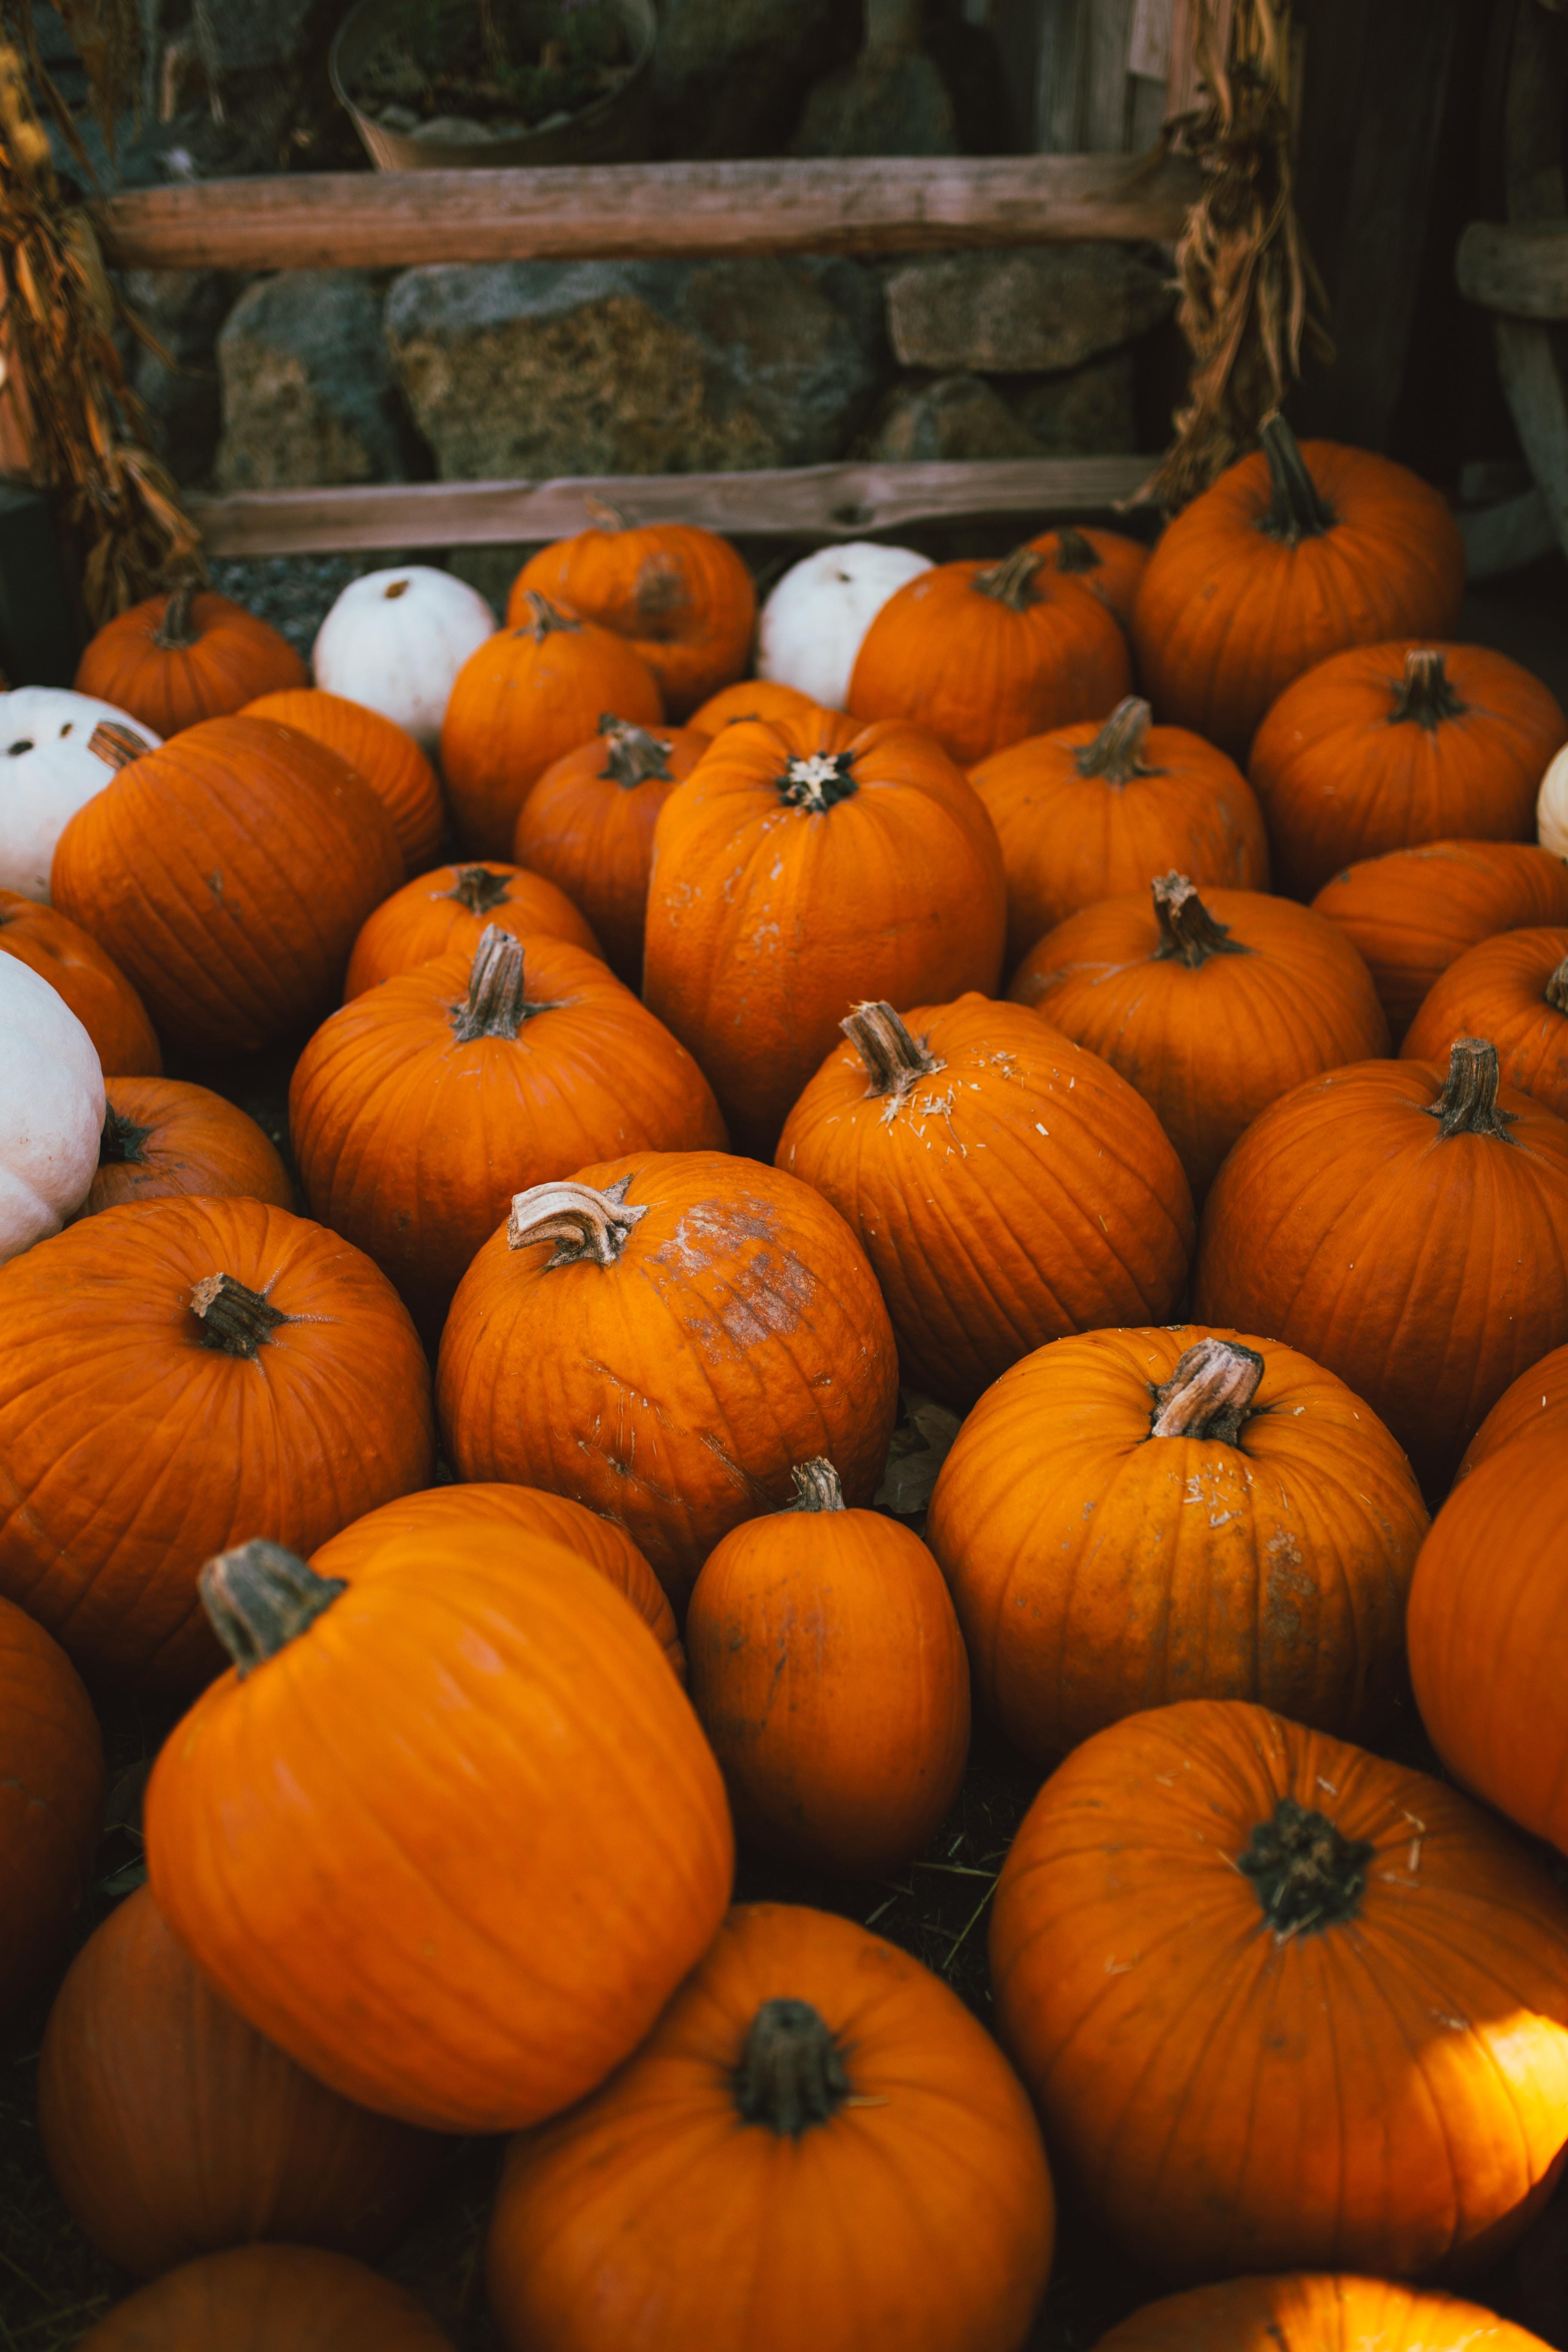 Pile of orange and white pumpkin at an autumnal farm